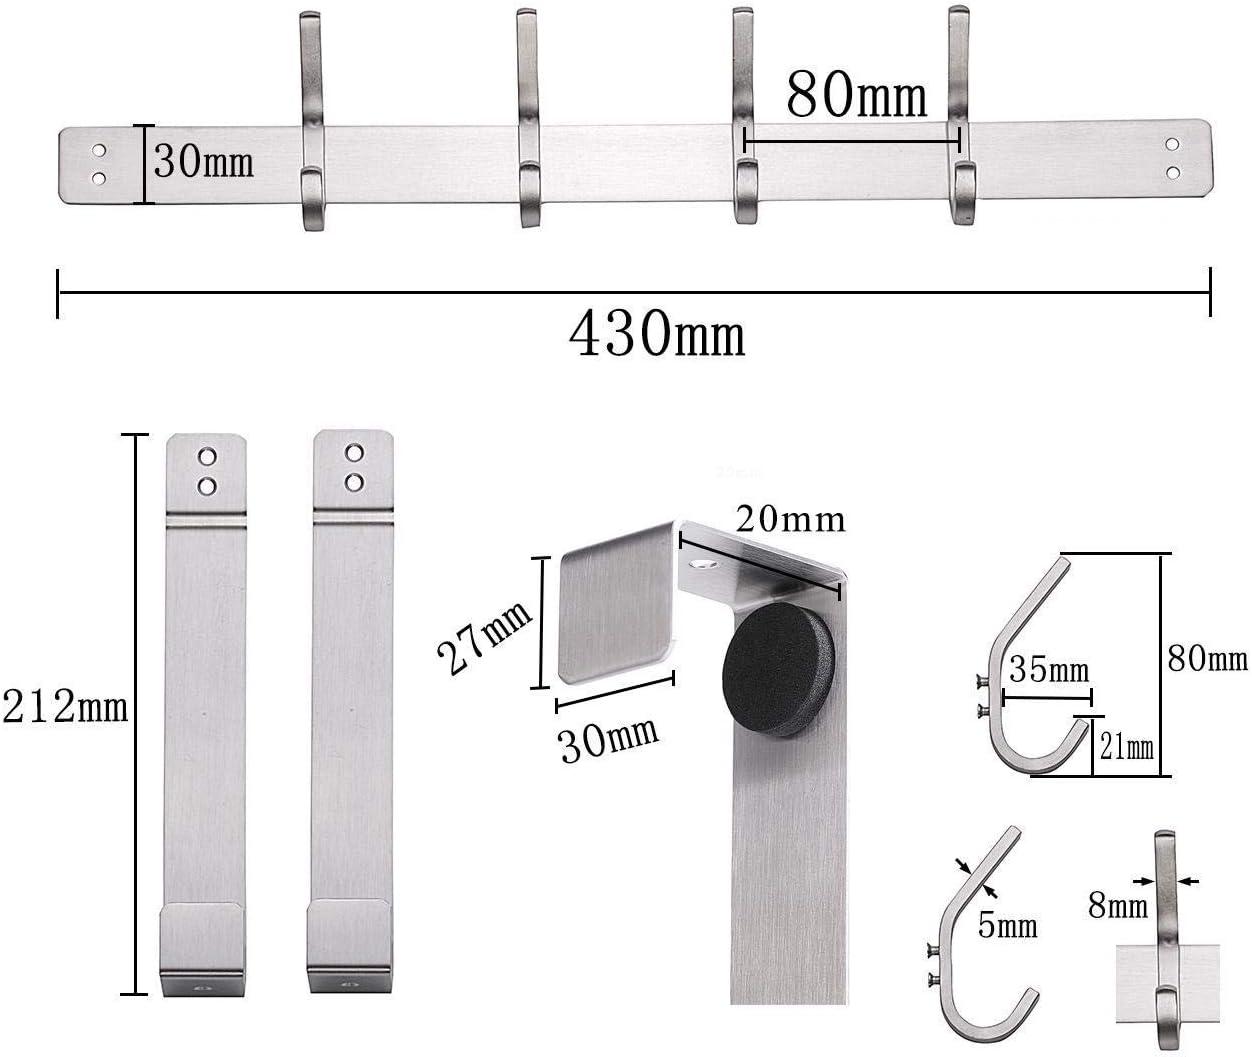 8.6 cm 4.1 cm Bademantelhaken mit 6 Haken Hakenleiste T/ürh/ängeleiste T/ürgarderobe Edelstahl Cupcinu T/ürhaken Edelstahl 43.5 cm